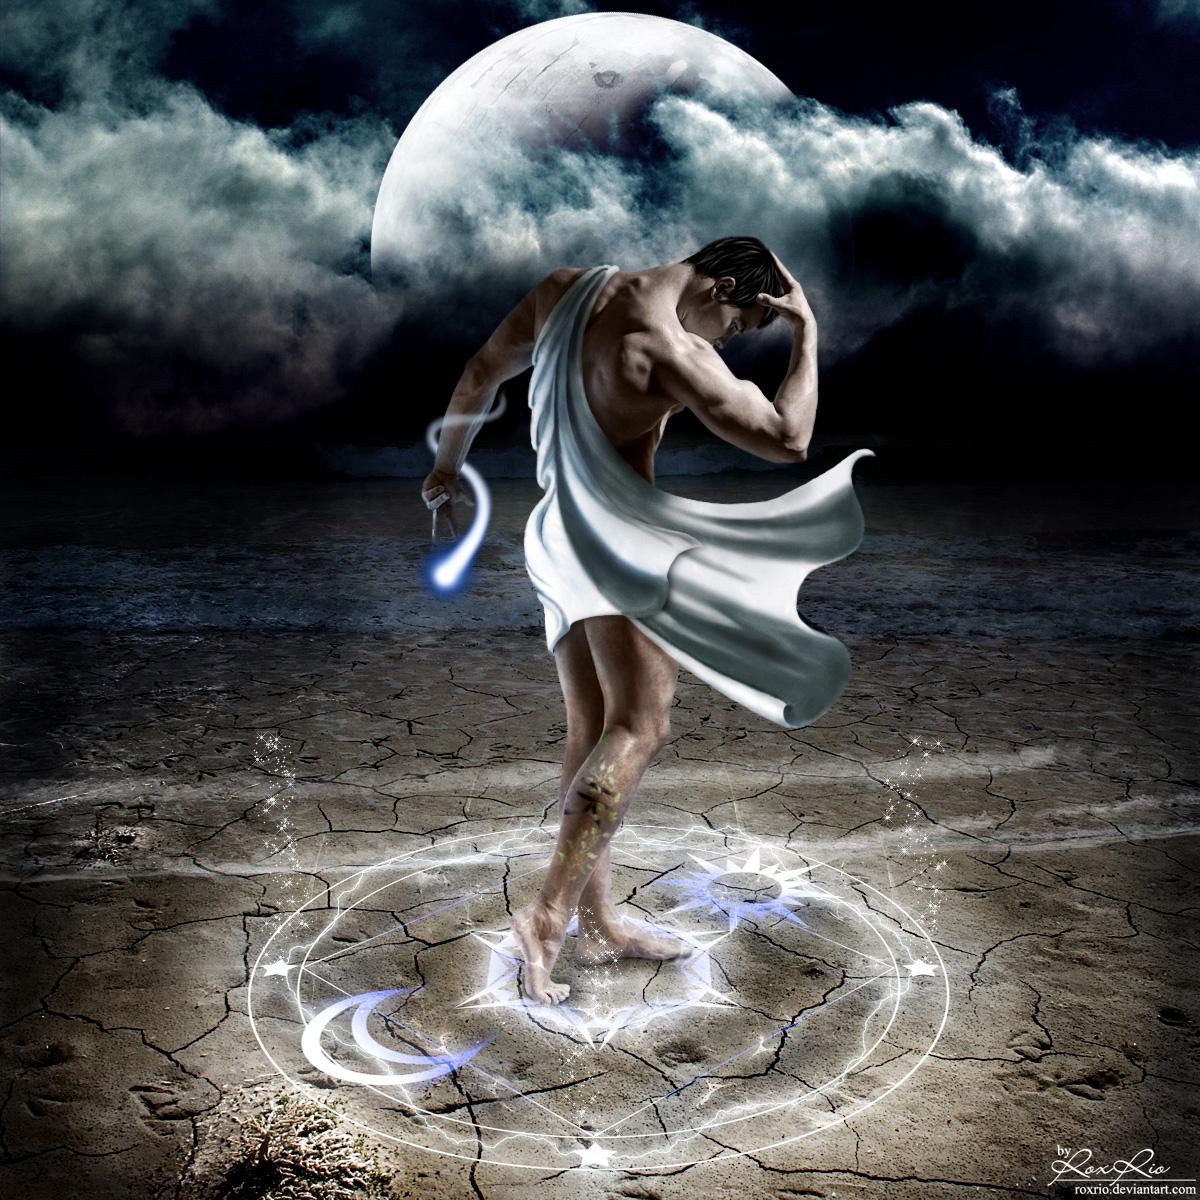 Moon Dancer by RoxRio